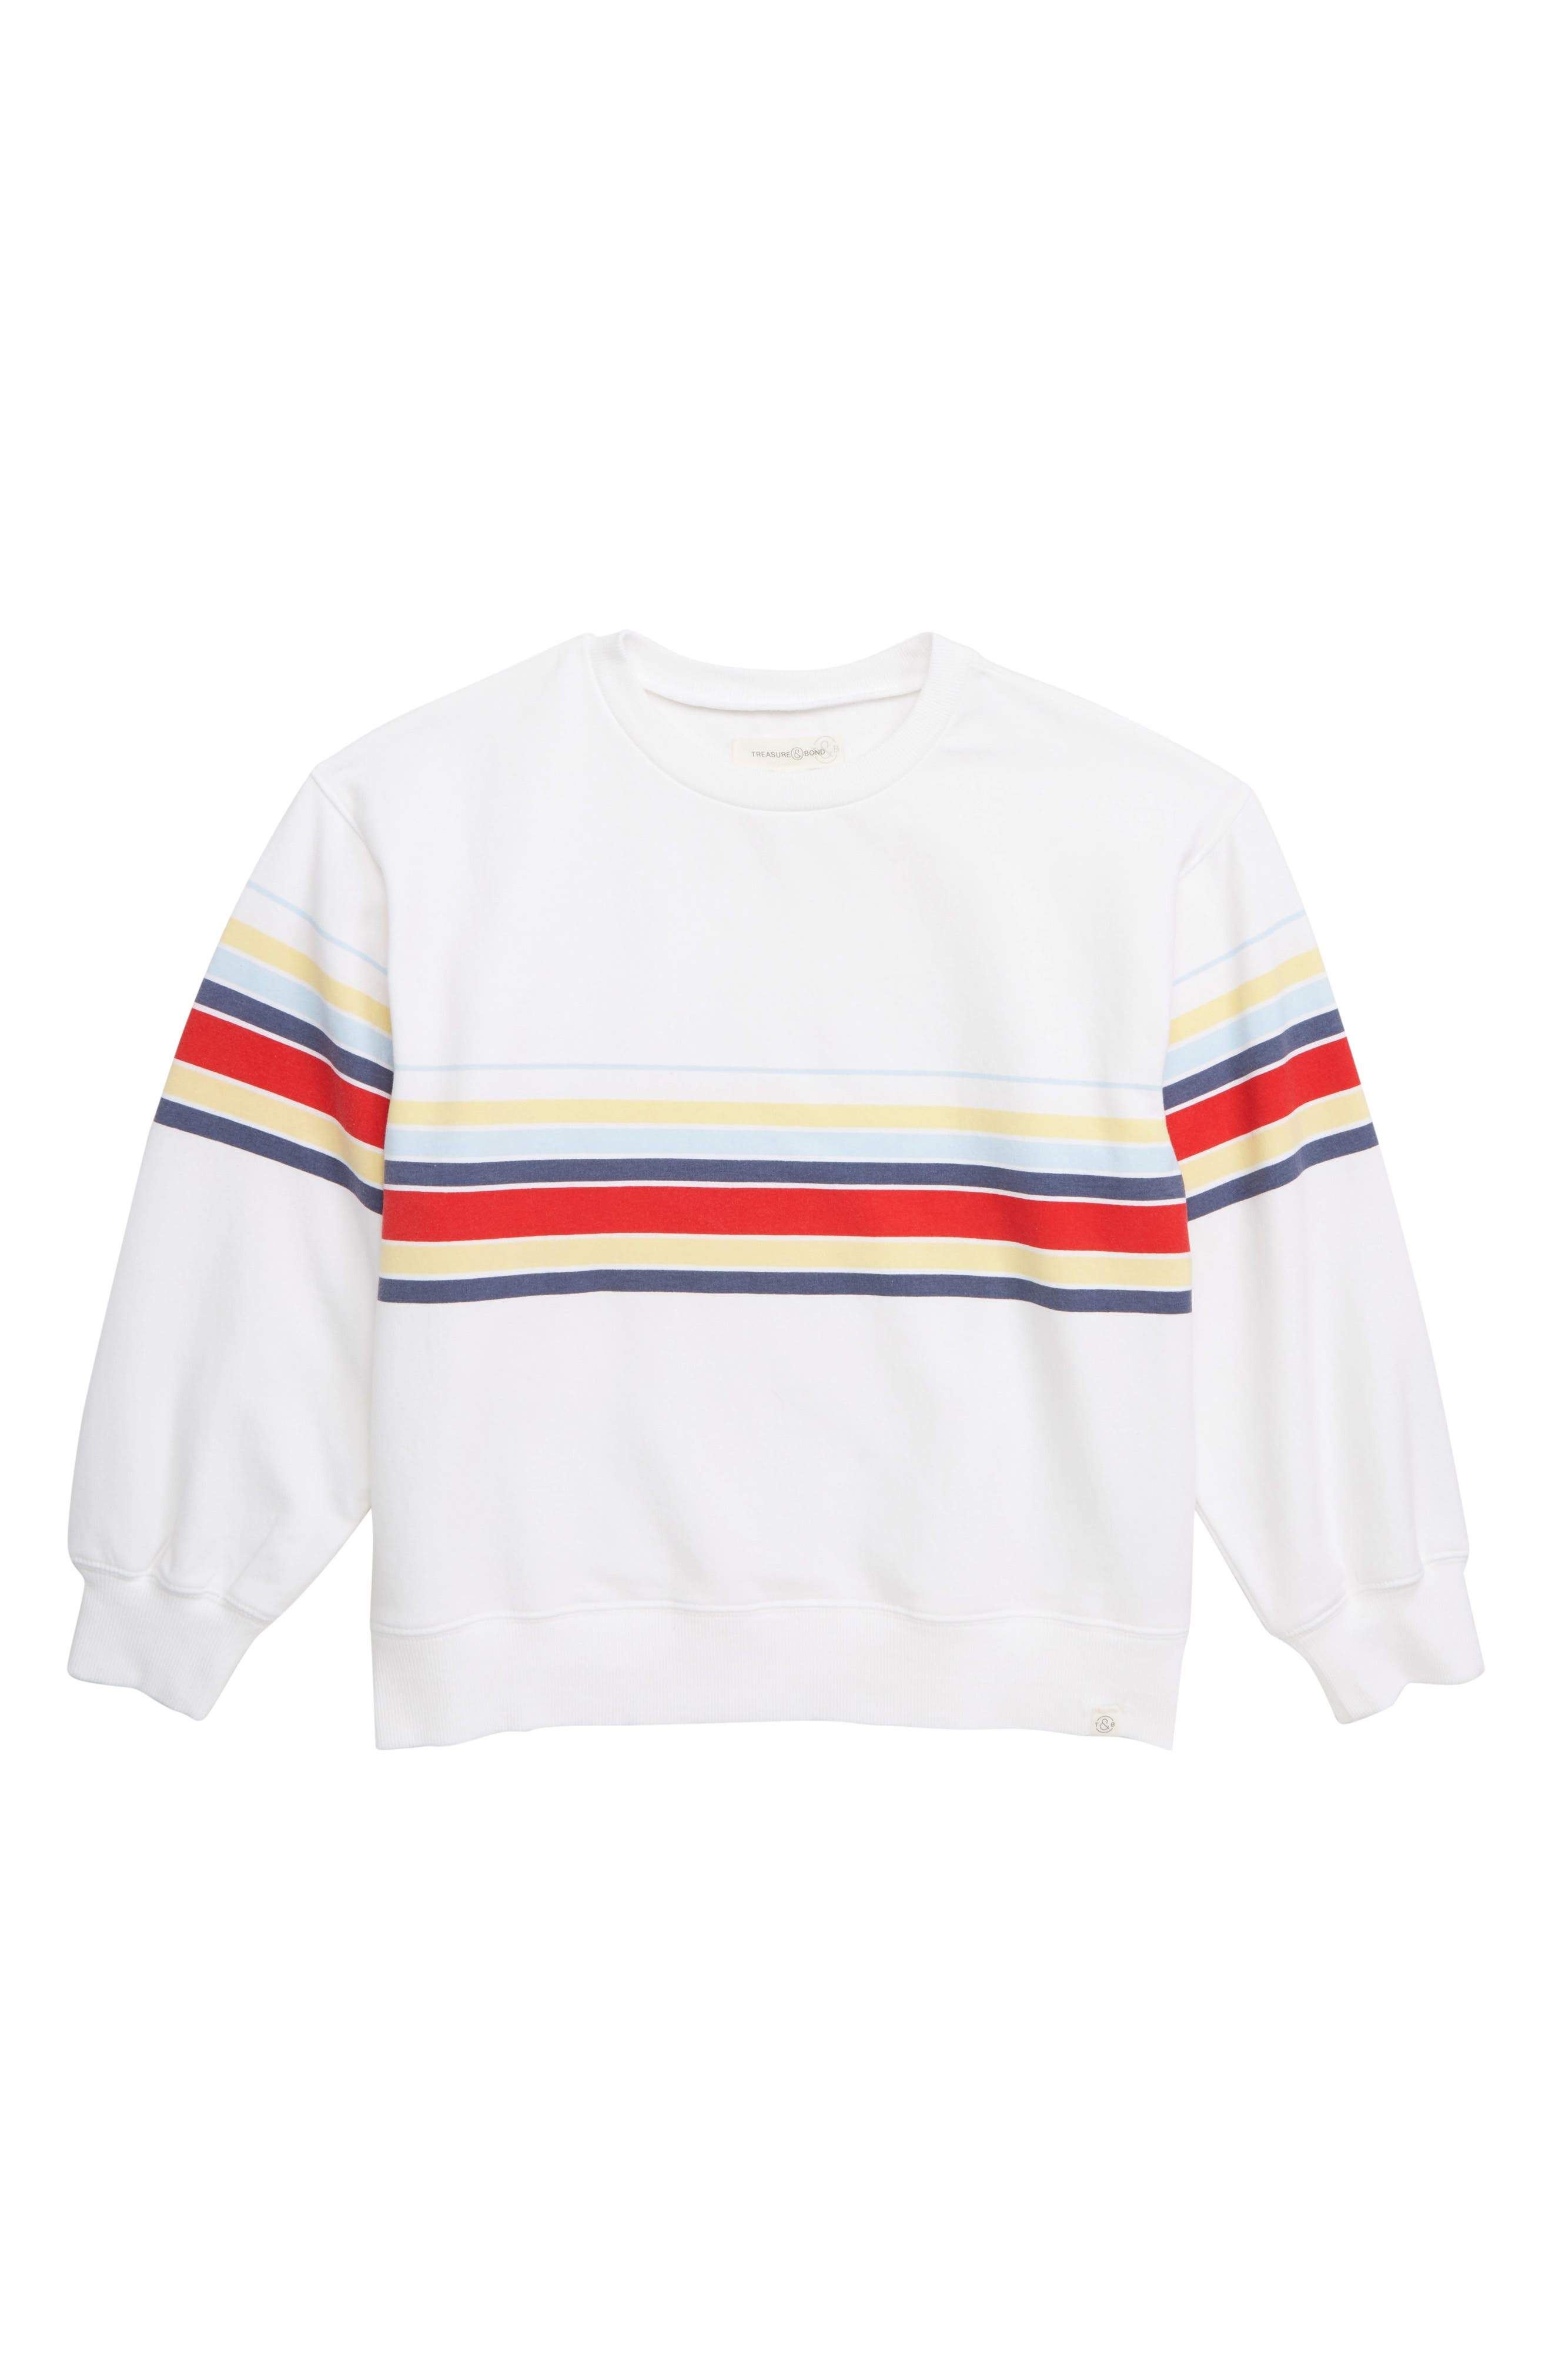 TREASURE & BOND Oversized Sweatshirt, Main, color, WHITE MALIBU STRIPE